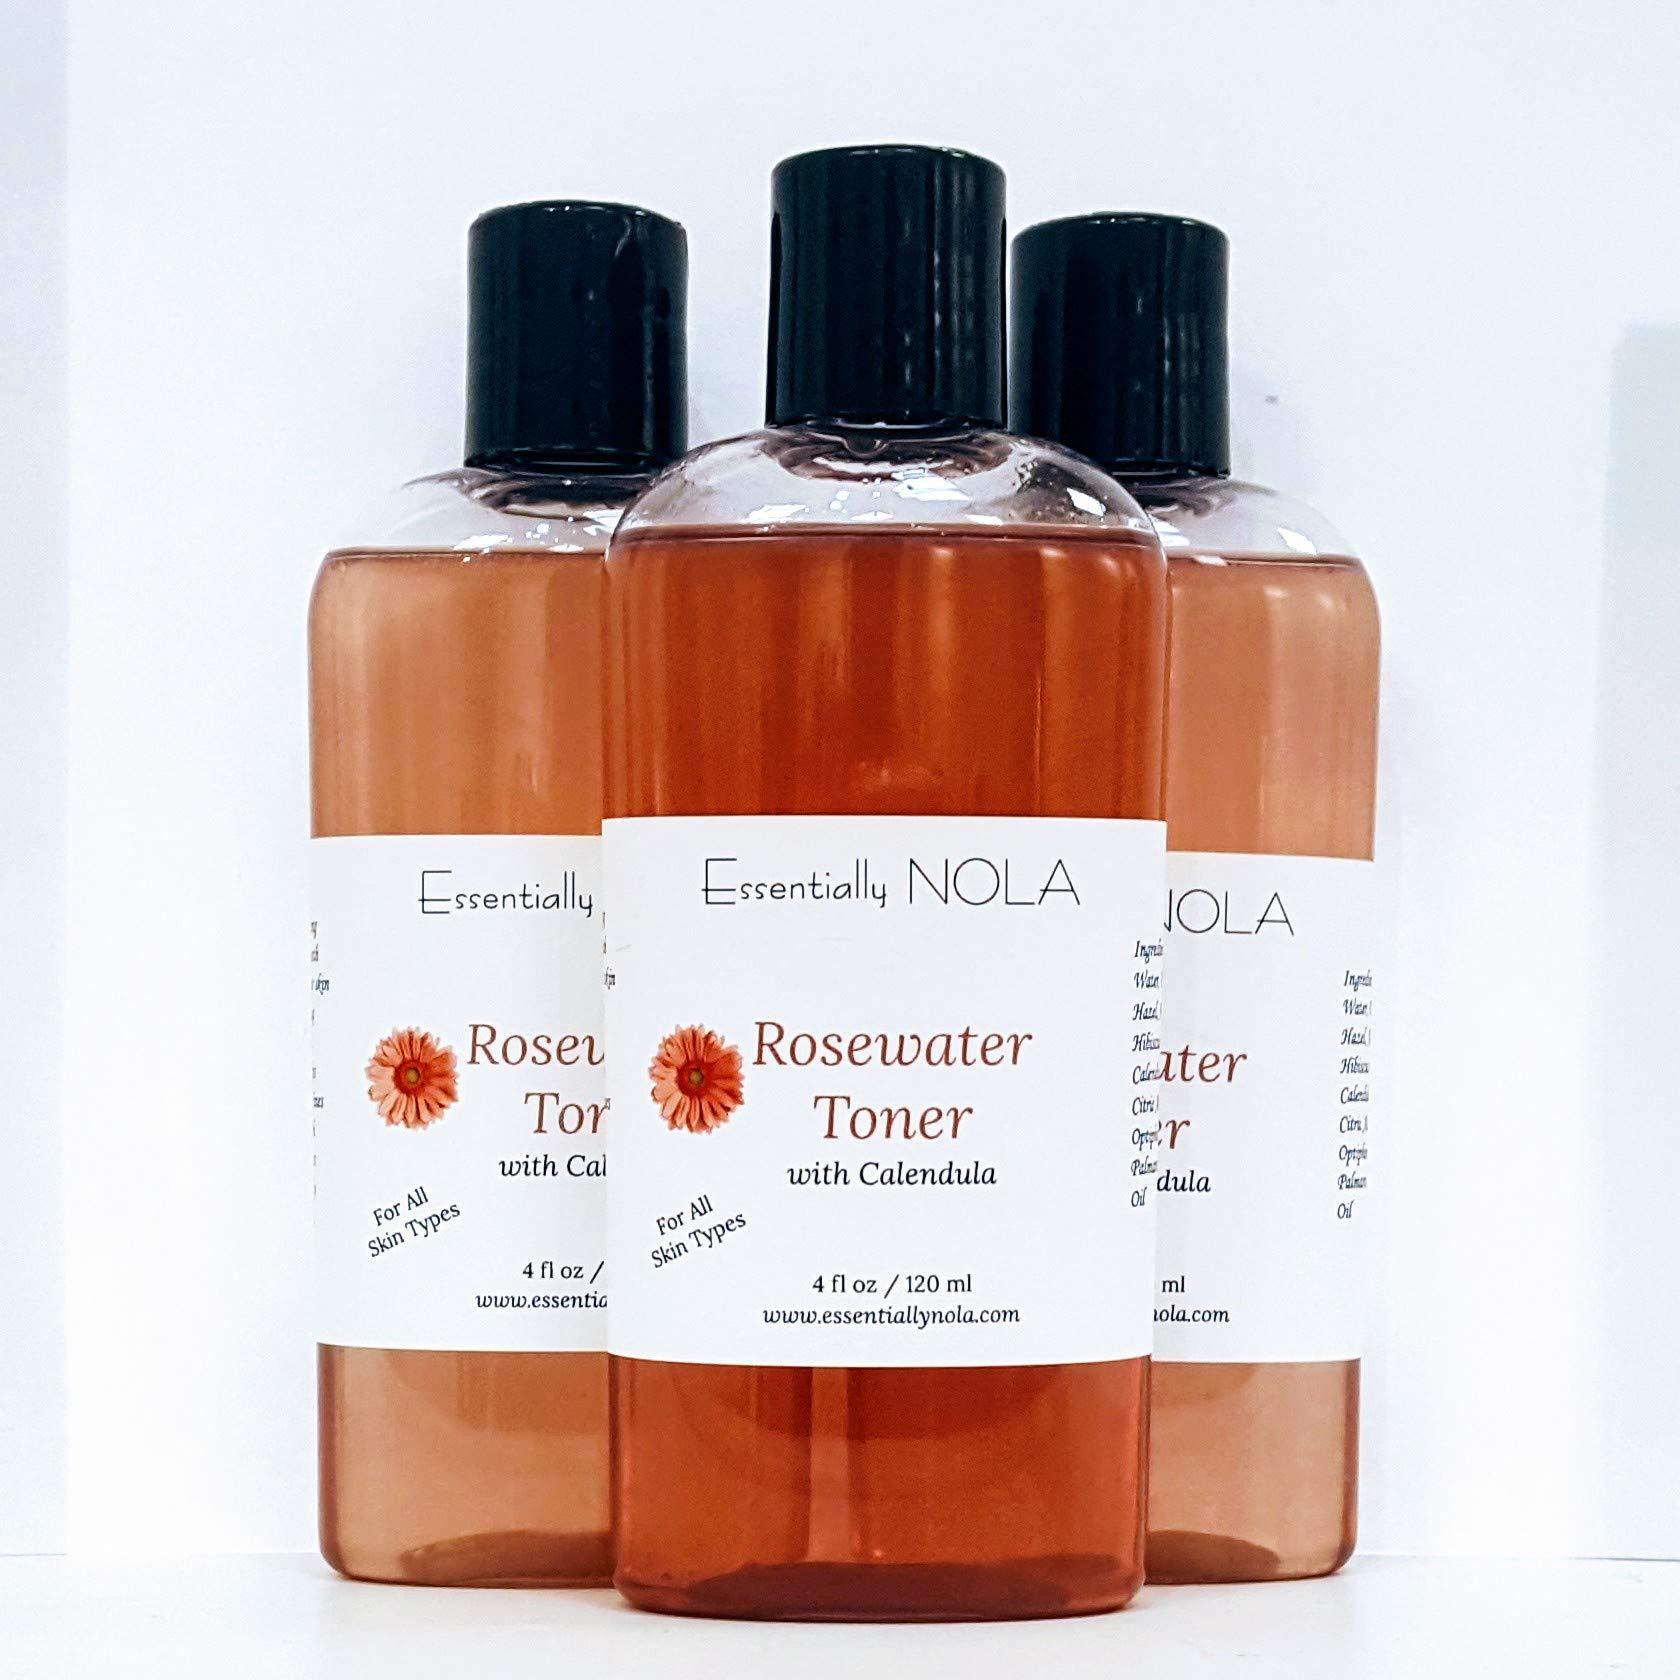 Rosewater Toner by EssentiallyNOLA